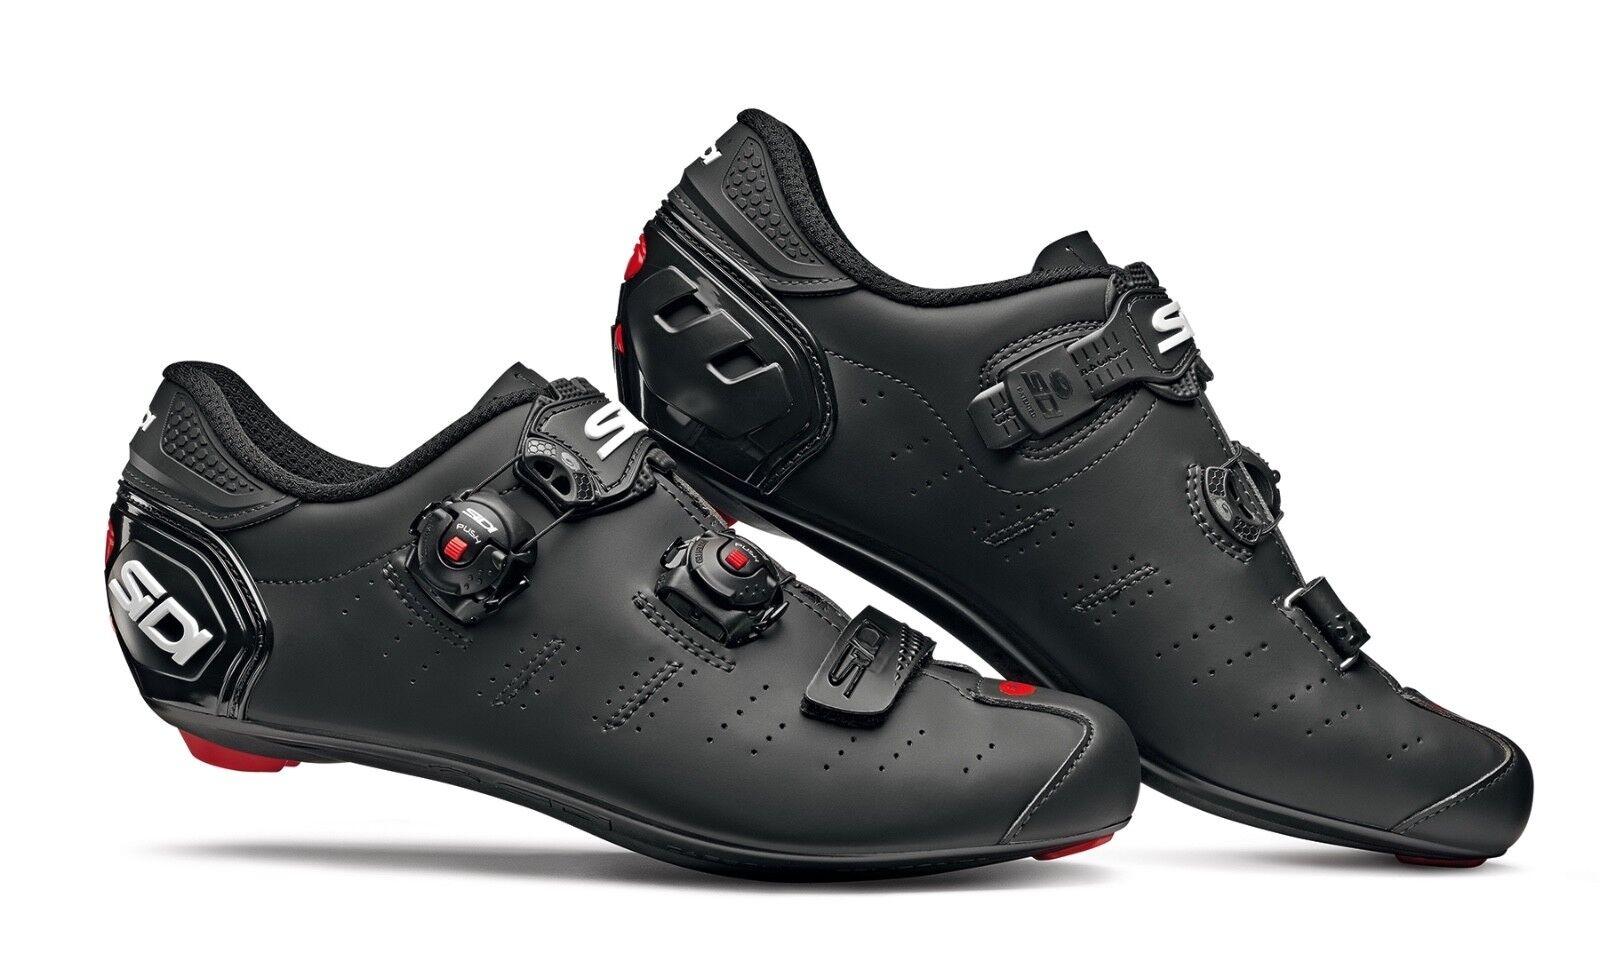 Schuhe Schuhe Schuhe SIDI ERGO 5 MATT NERO Größe 43.5 529a79